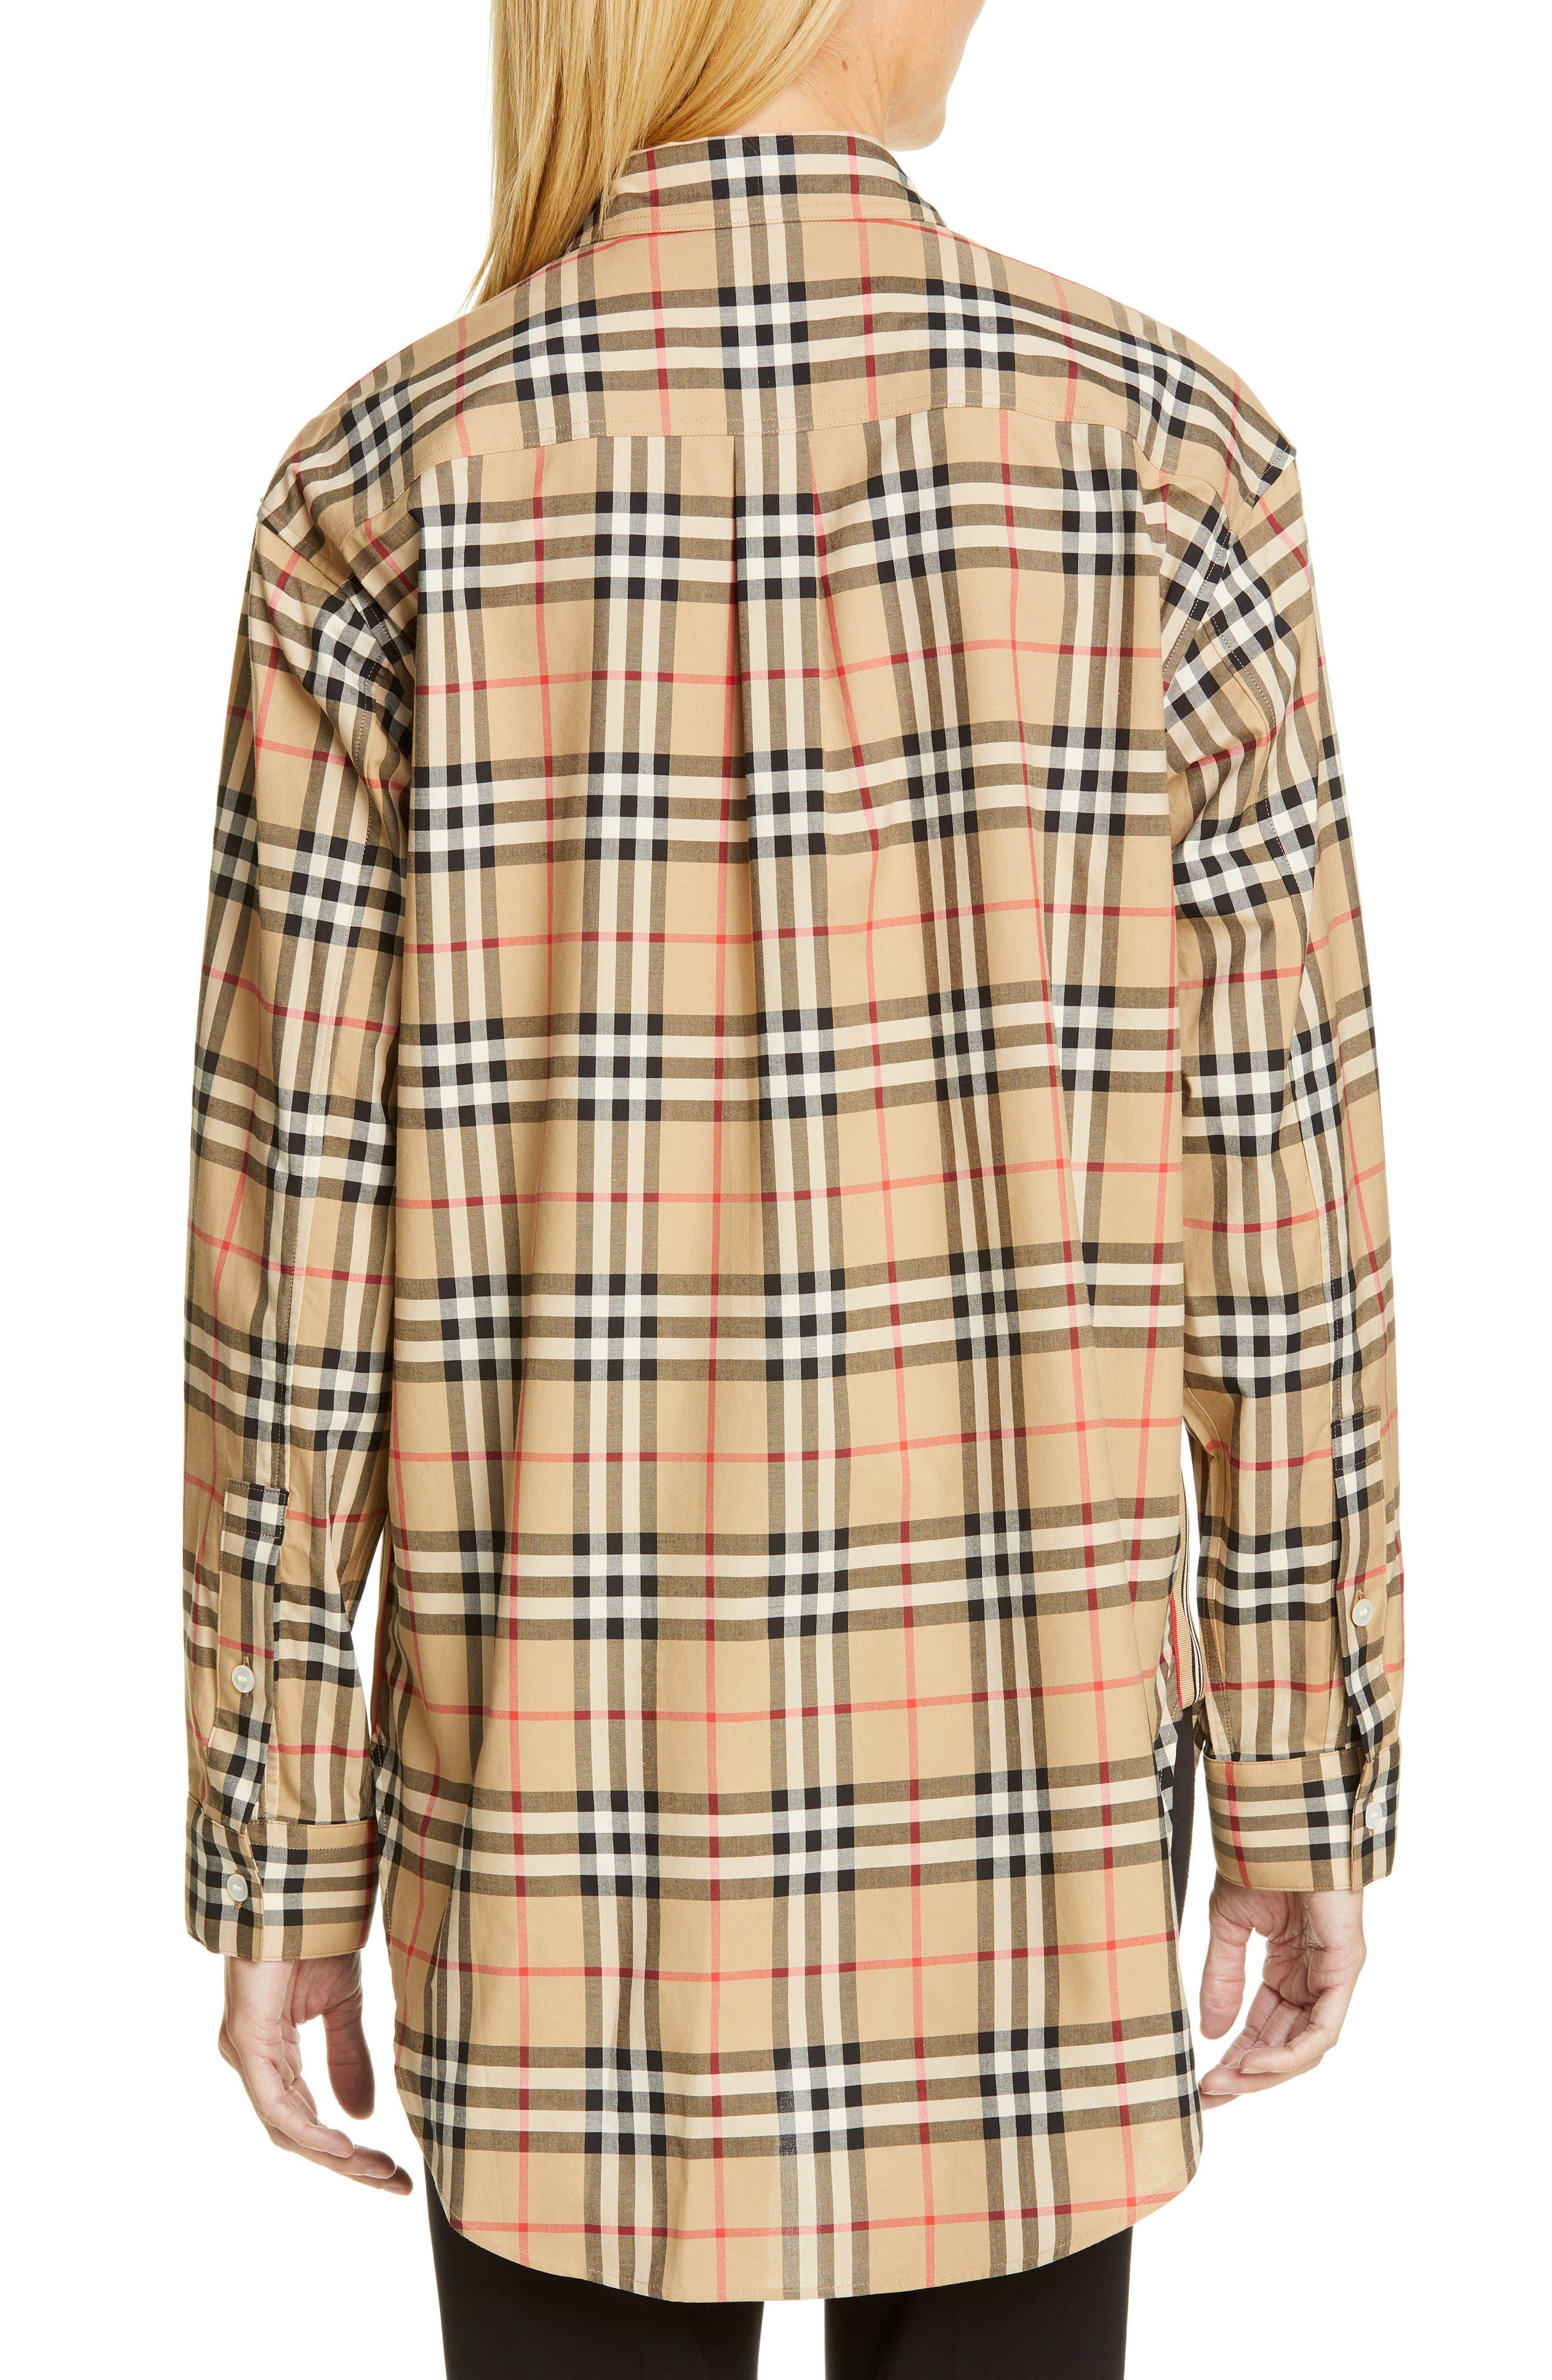 BURBERRY, Turnstone Check Shirt, Alternate thumbnail 2, color, ARCHIVE BEIGE IP CHK